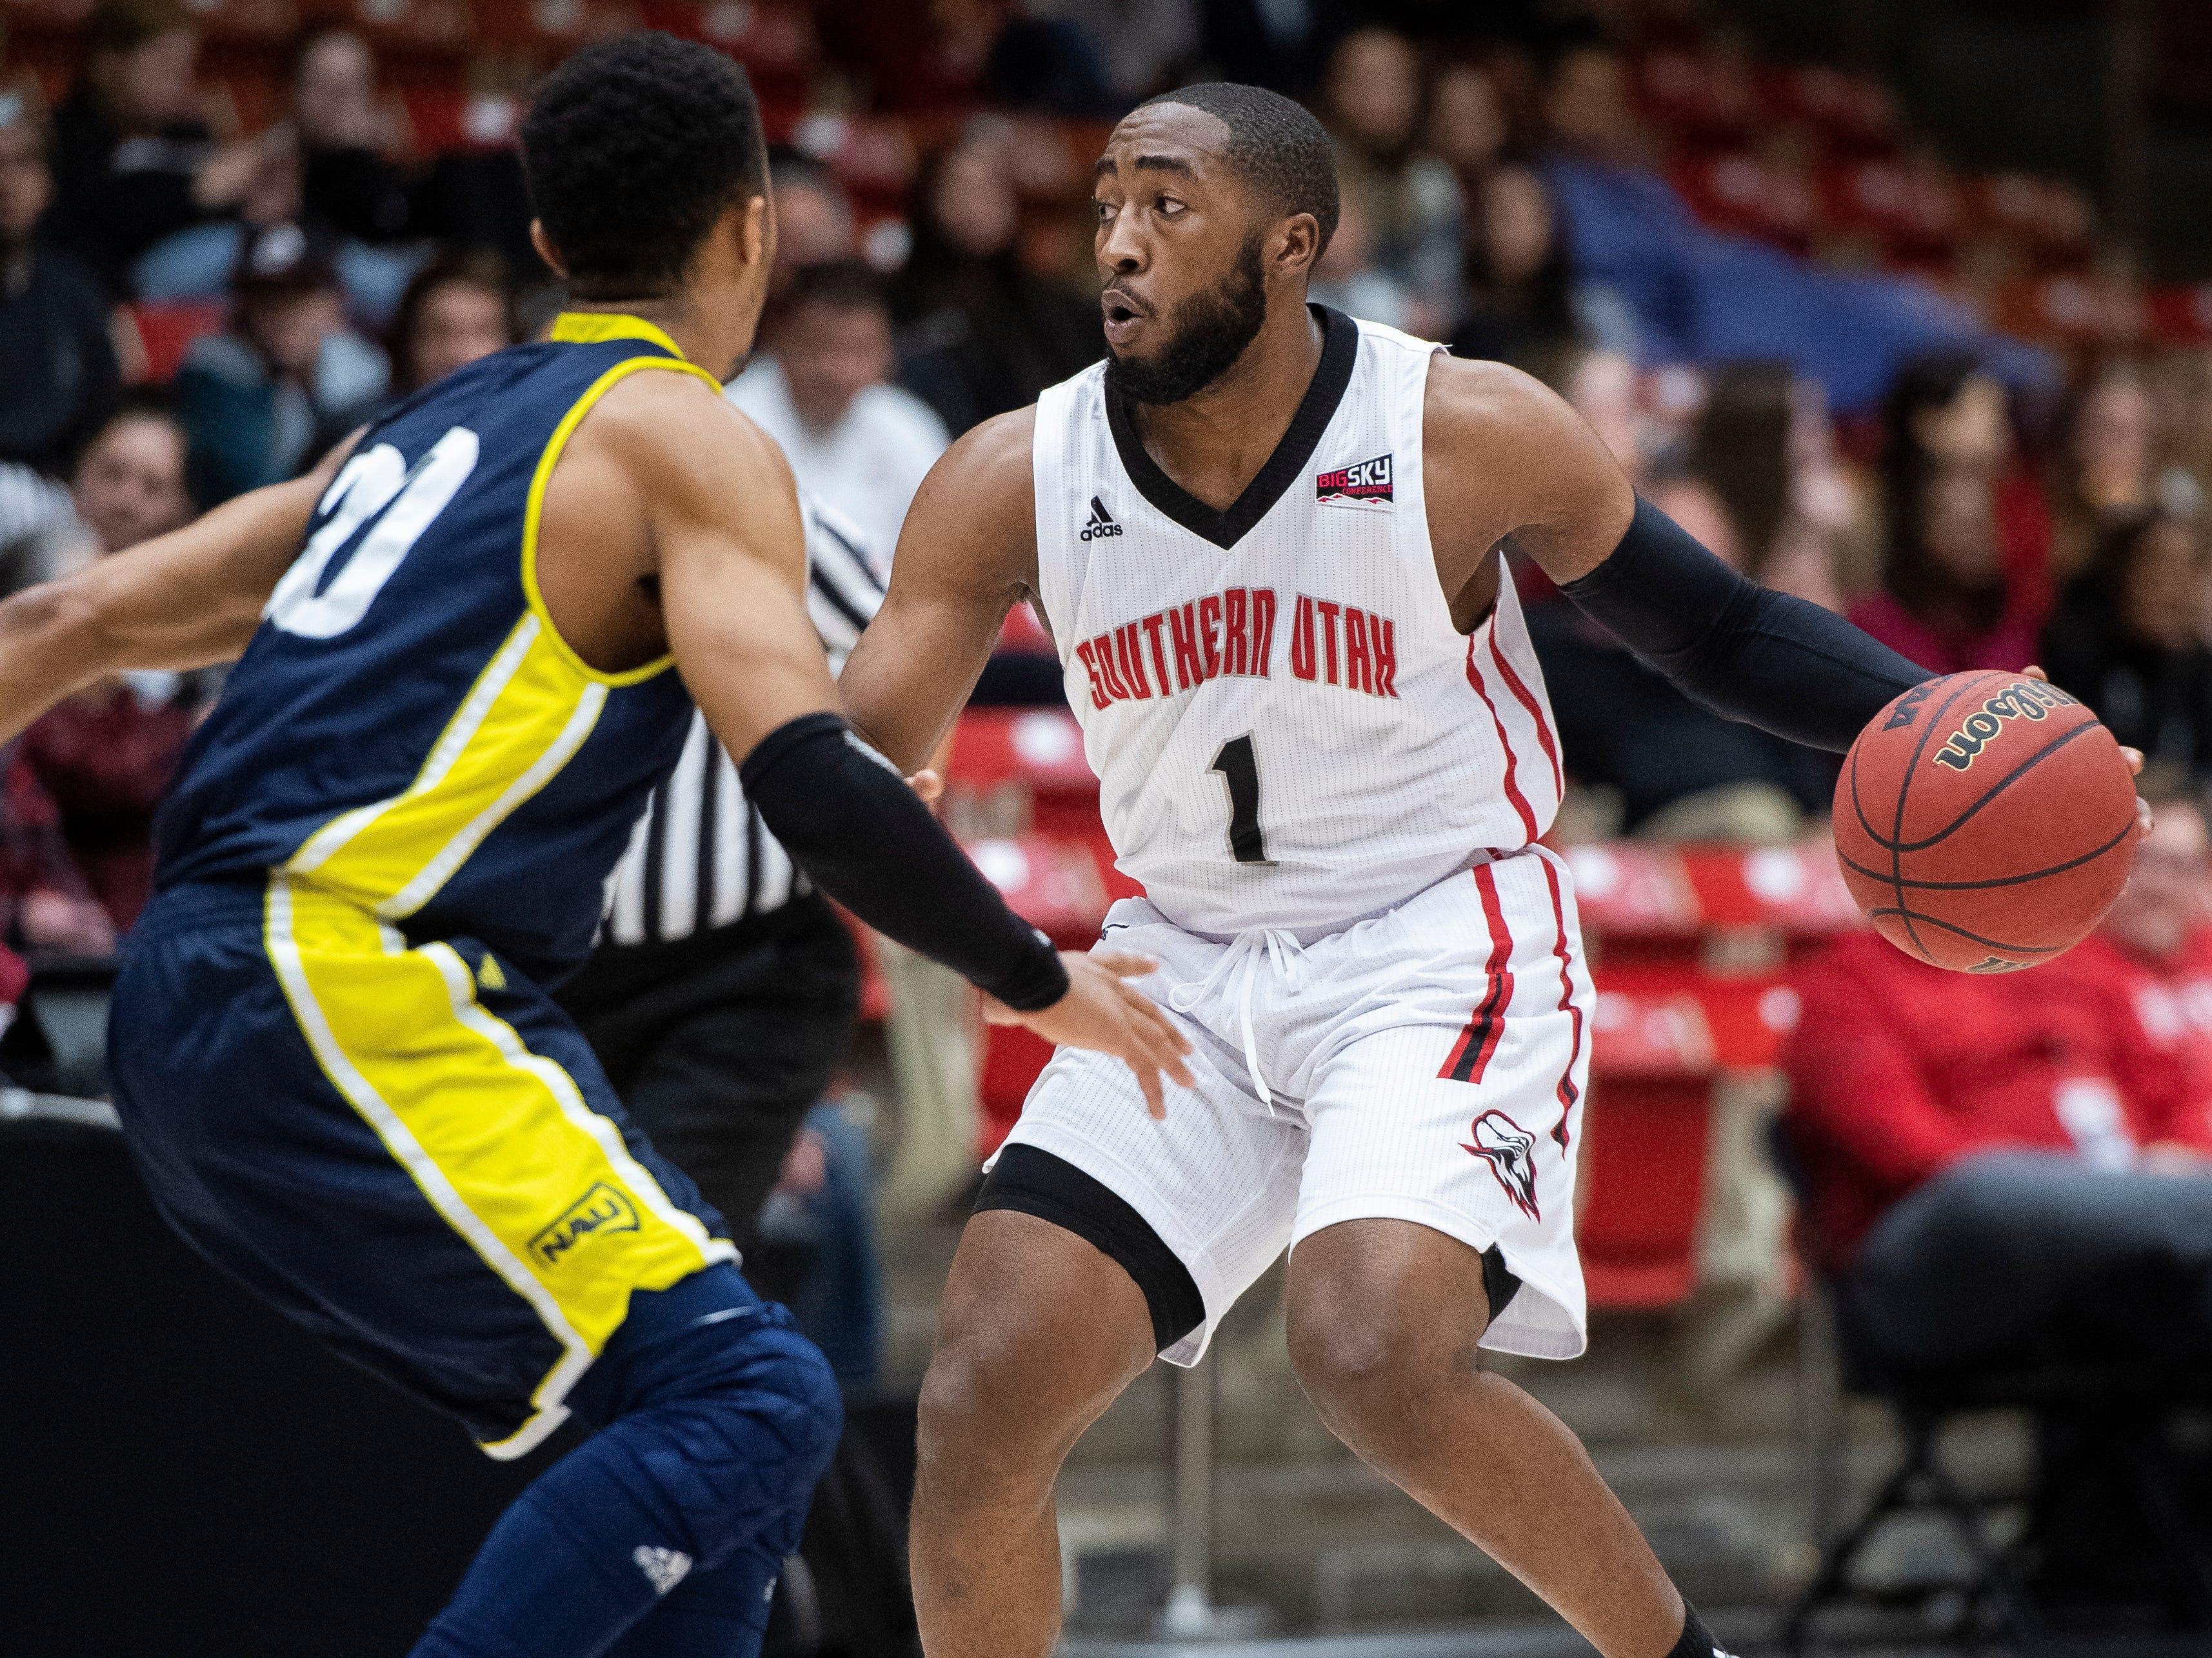 Southern Utah University freshman Kenton Eskridge (1) looks for options against rival Northern Arizona at the America First Event Center Saturday, January 12, 2019. SUU won, 84-82.